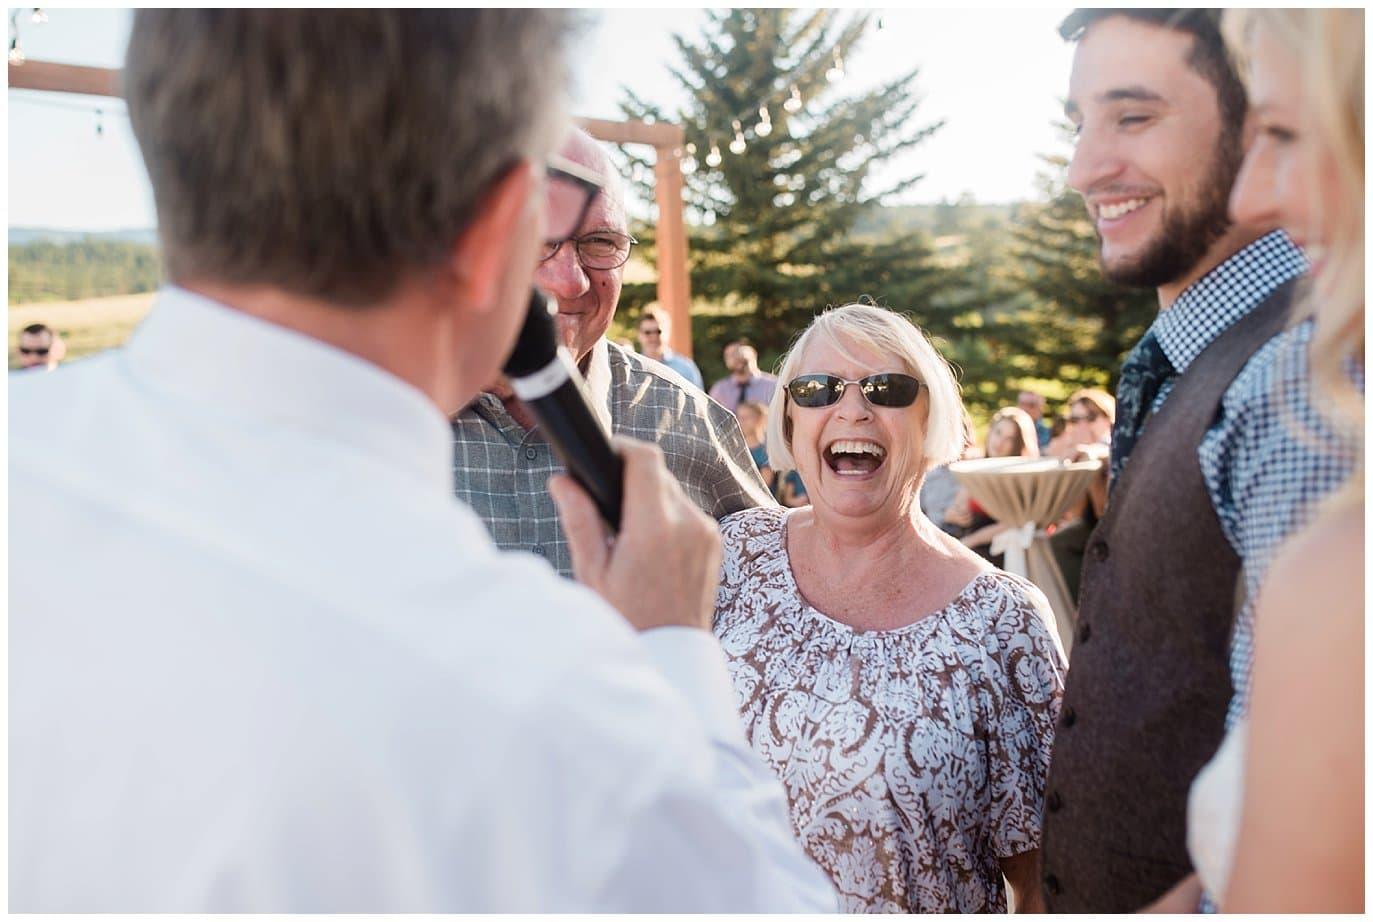 wedding reception at Deer Creek Valley Ranch wedding by Boulder Wedding Photographer Jennie Crate Photographer